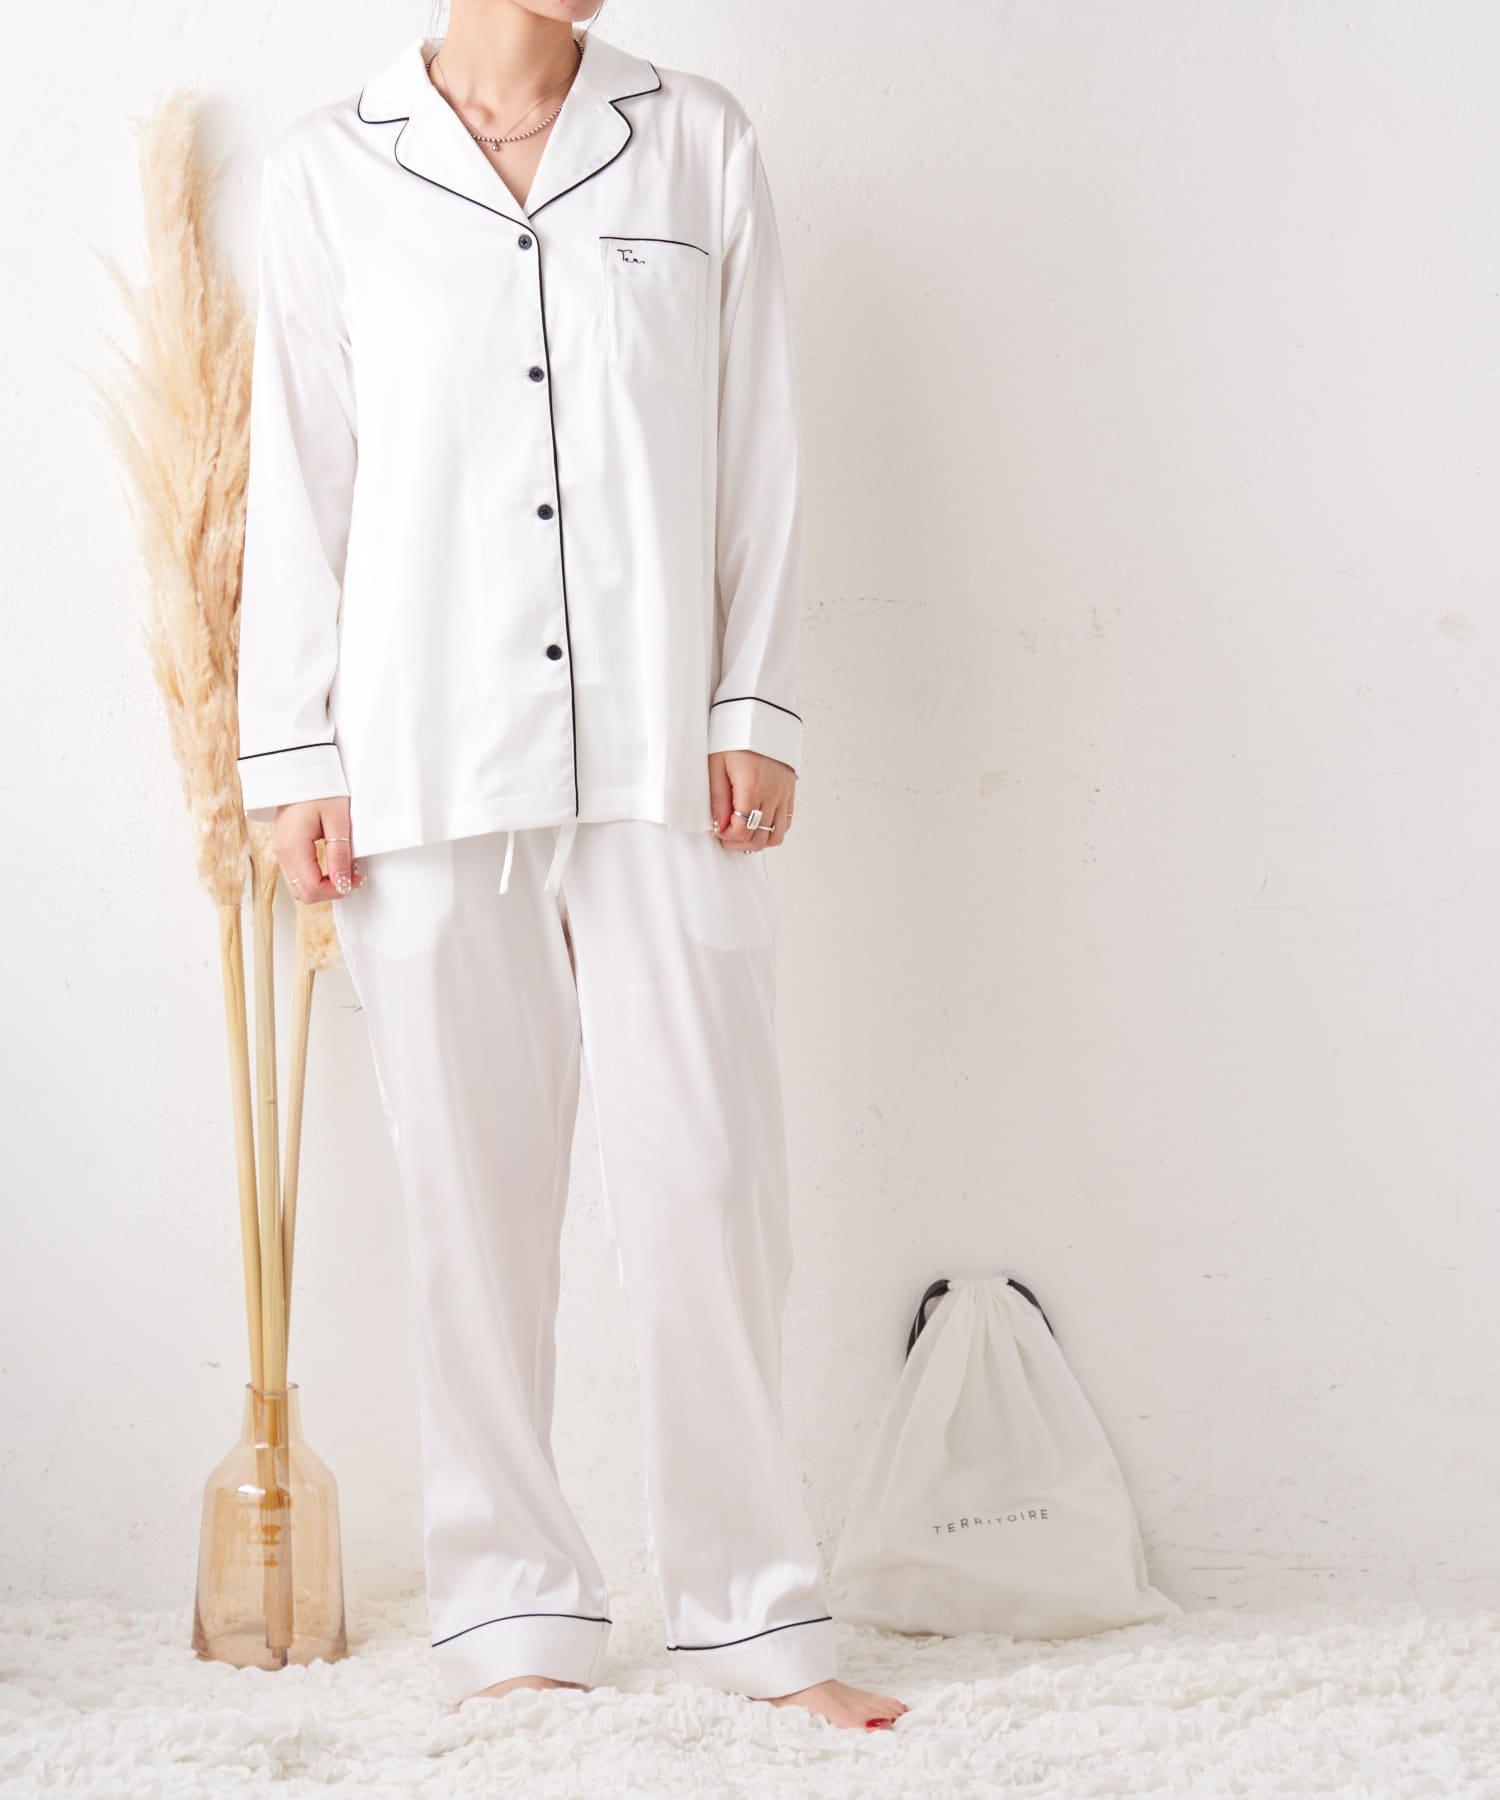 TERRITOIRE(テリトワール) 【TERRITOIREプレミアム】LADIES シルクタッチサテンパジャマ